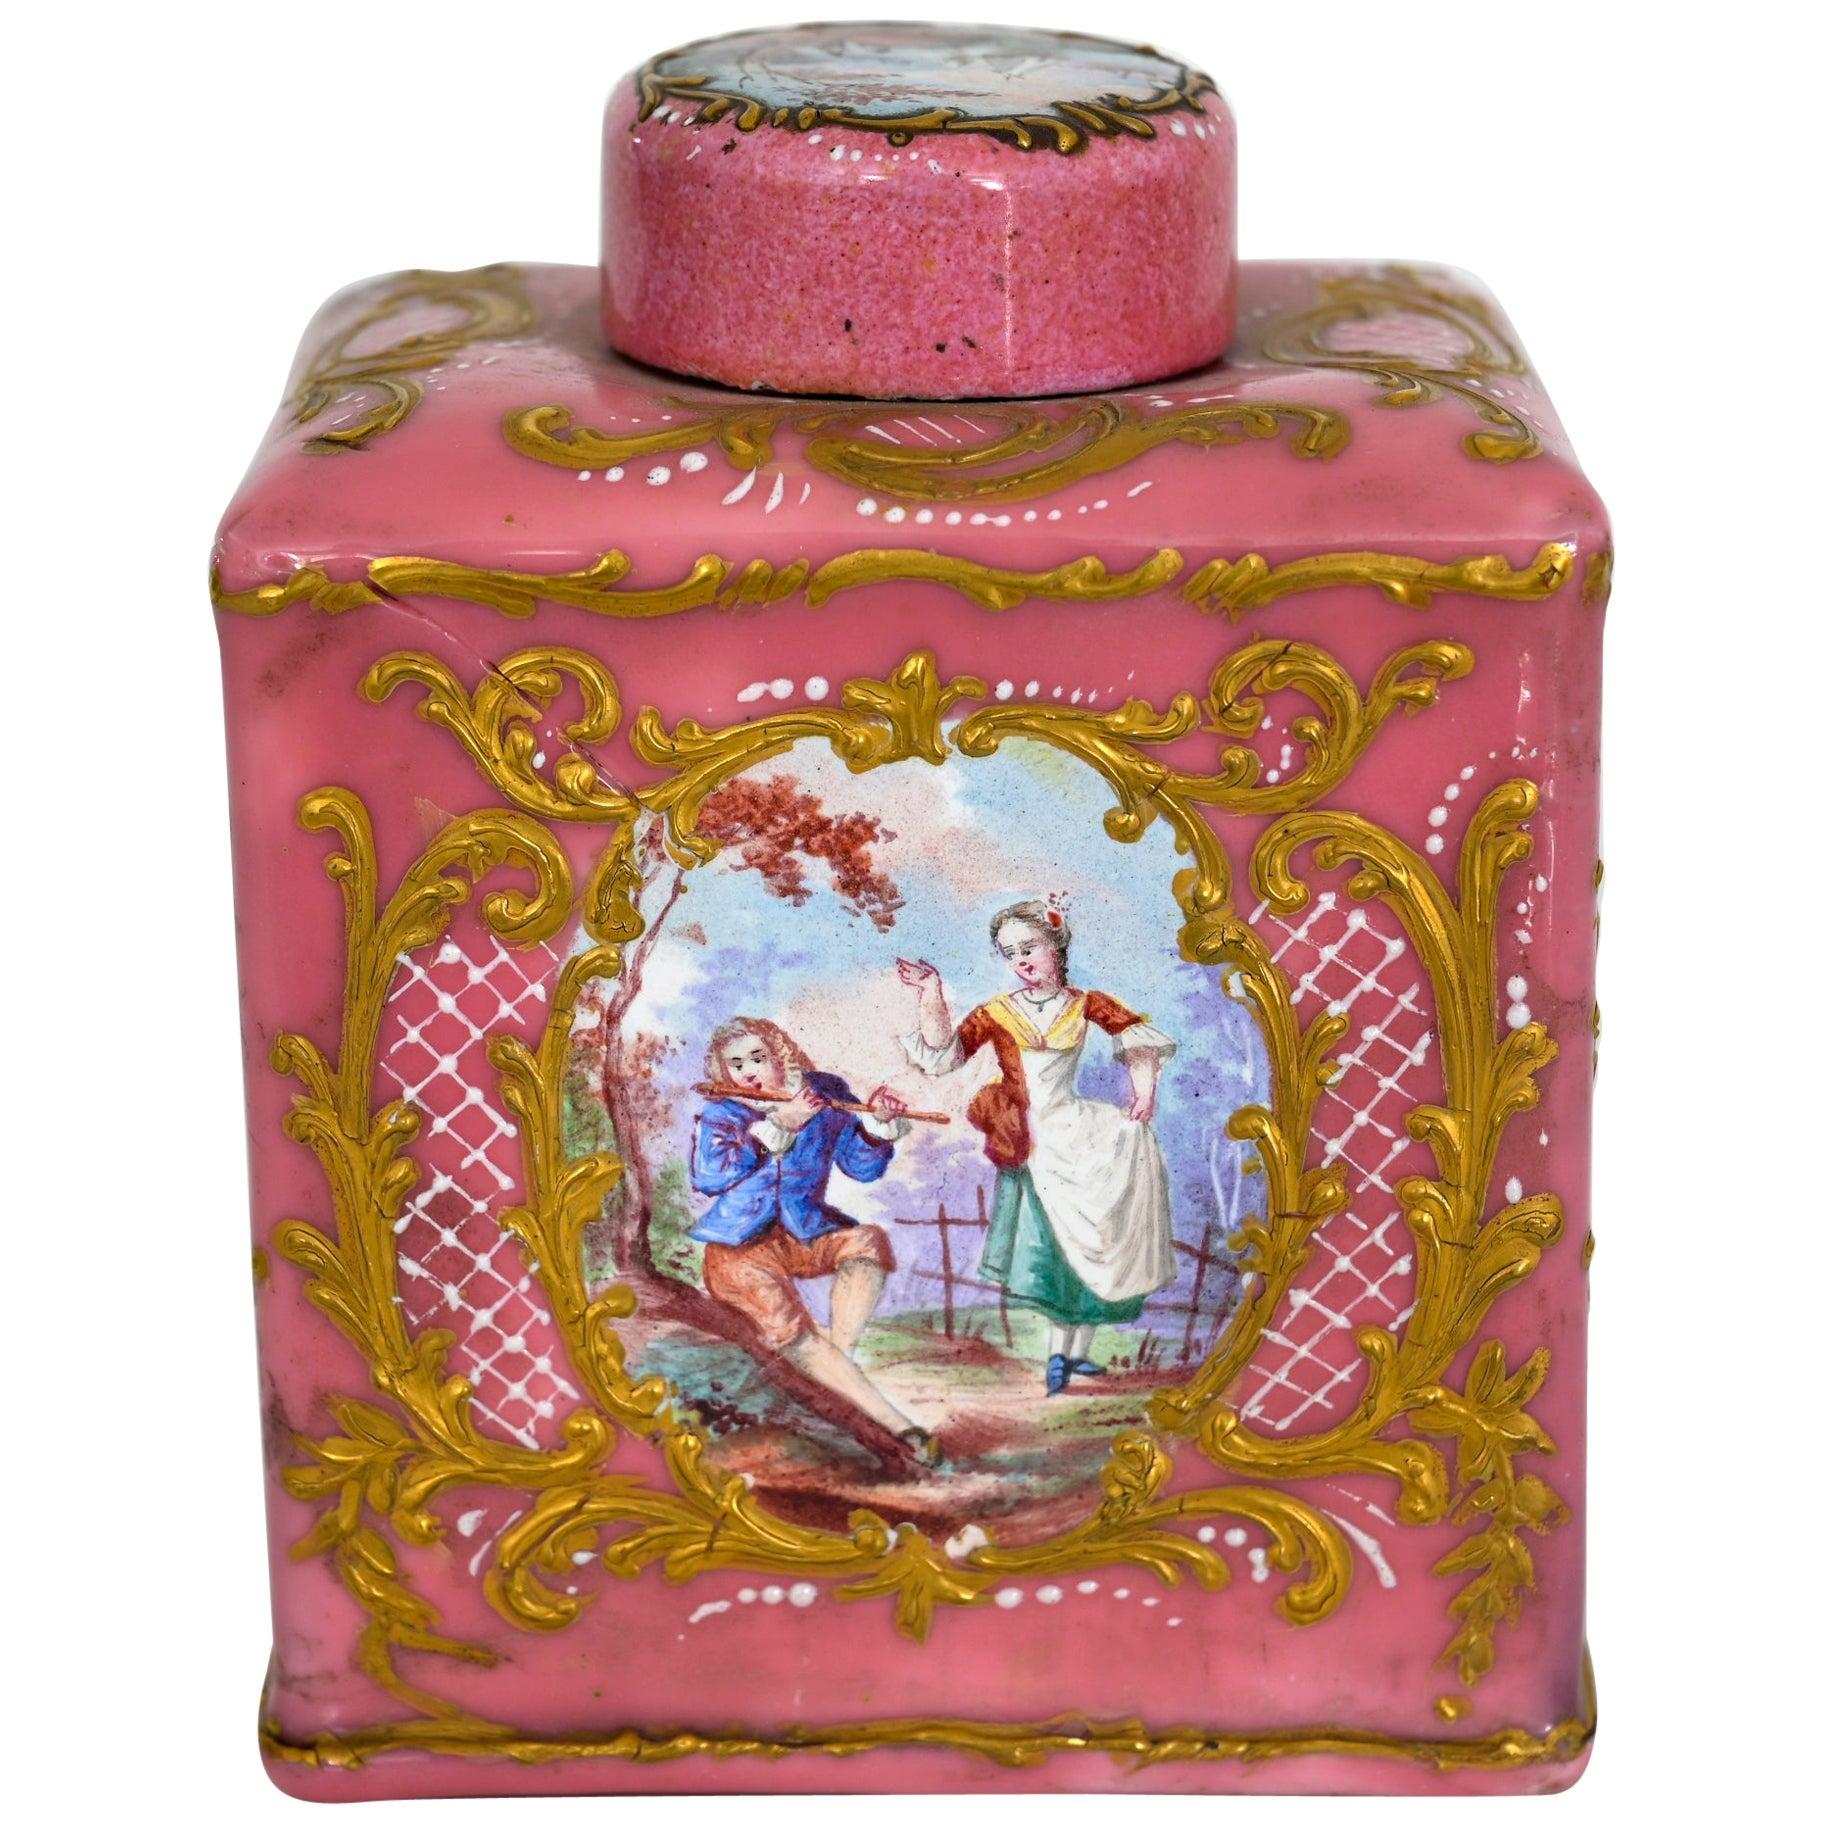 Enamel Tea Caddy Vienna 18th Century with Landscape